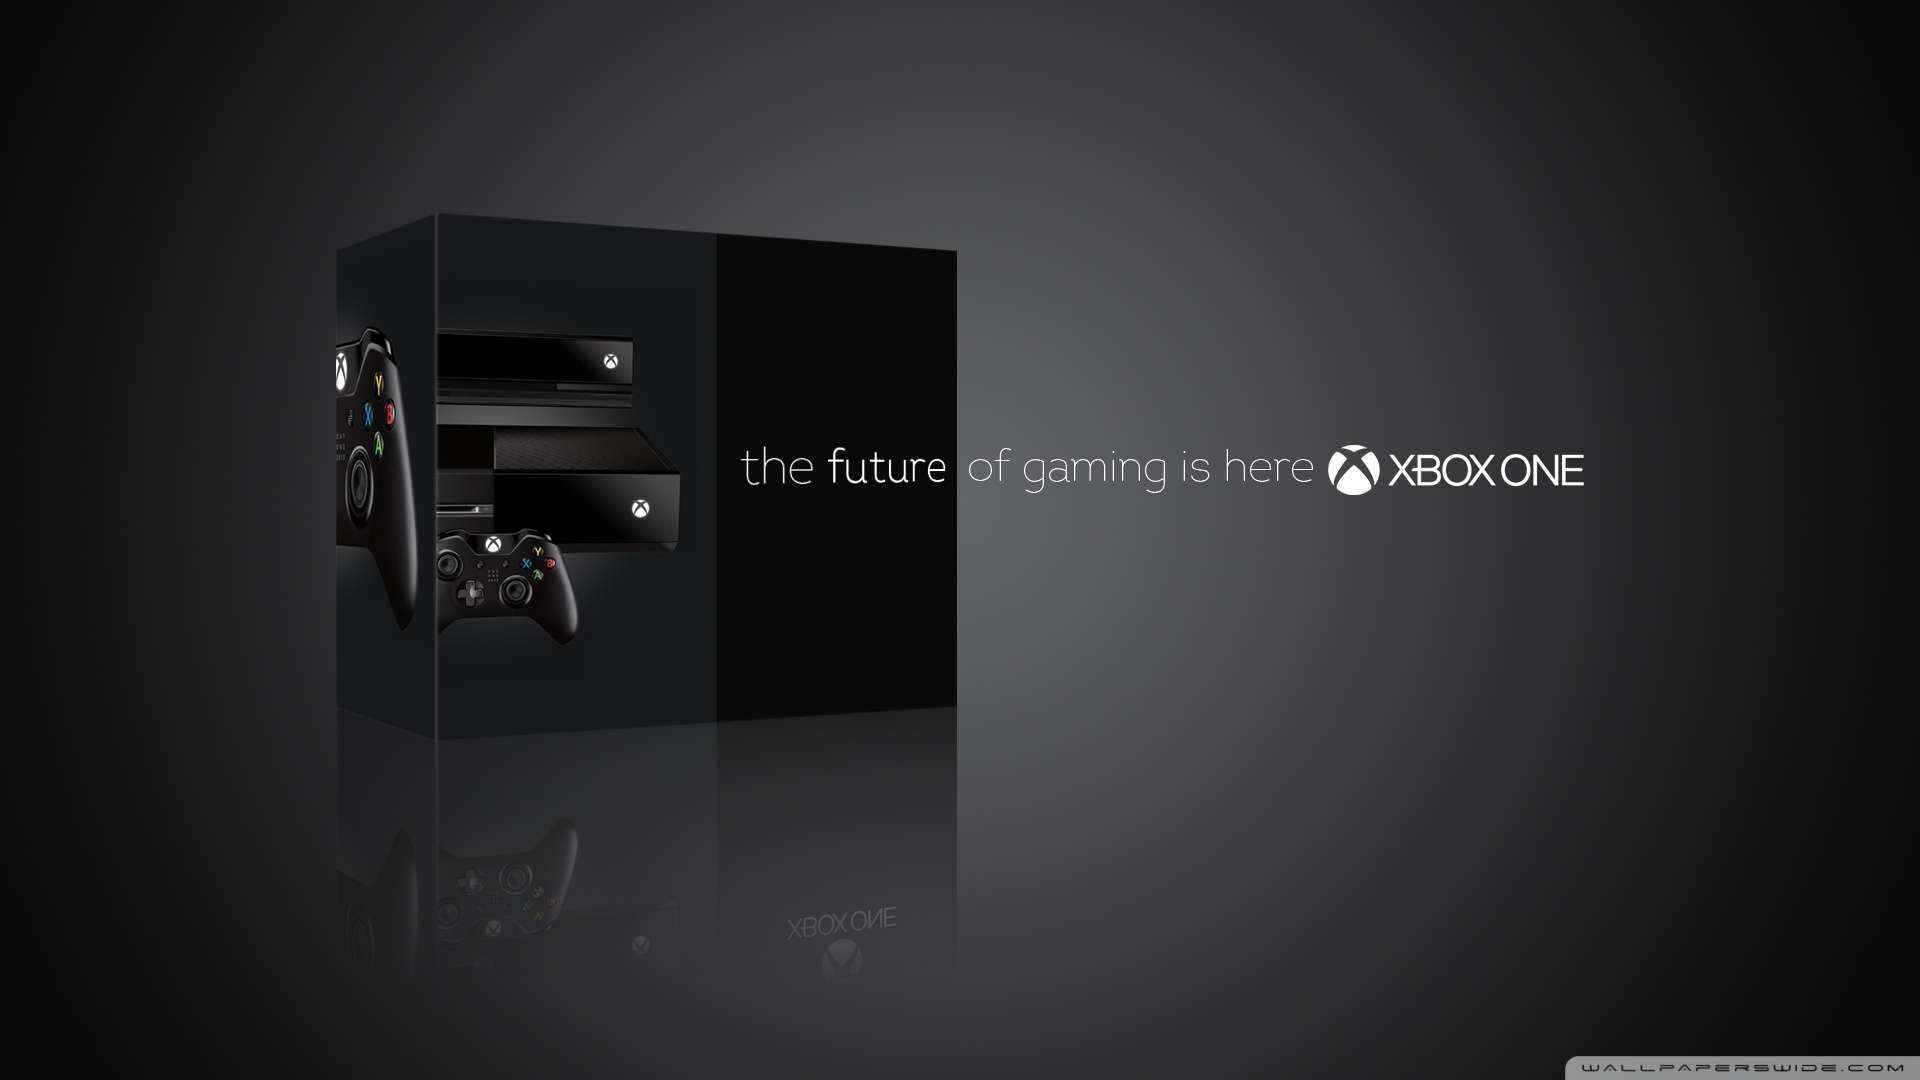 Download Xbox One Future Of Gaming Wallpaper 1080p HD HDWallWidecom 1920x1080